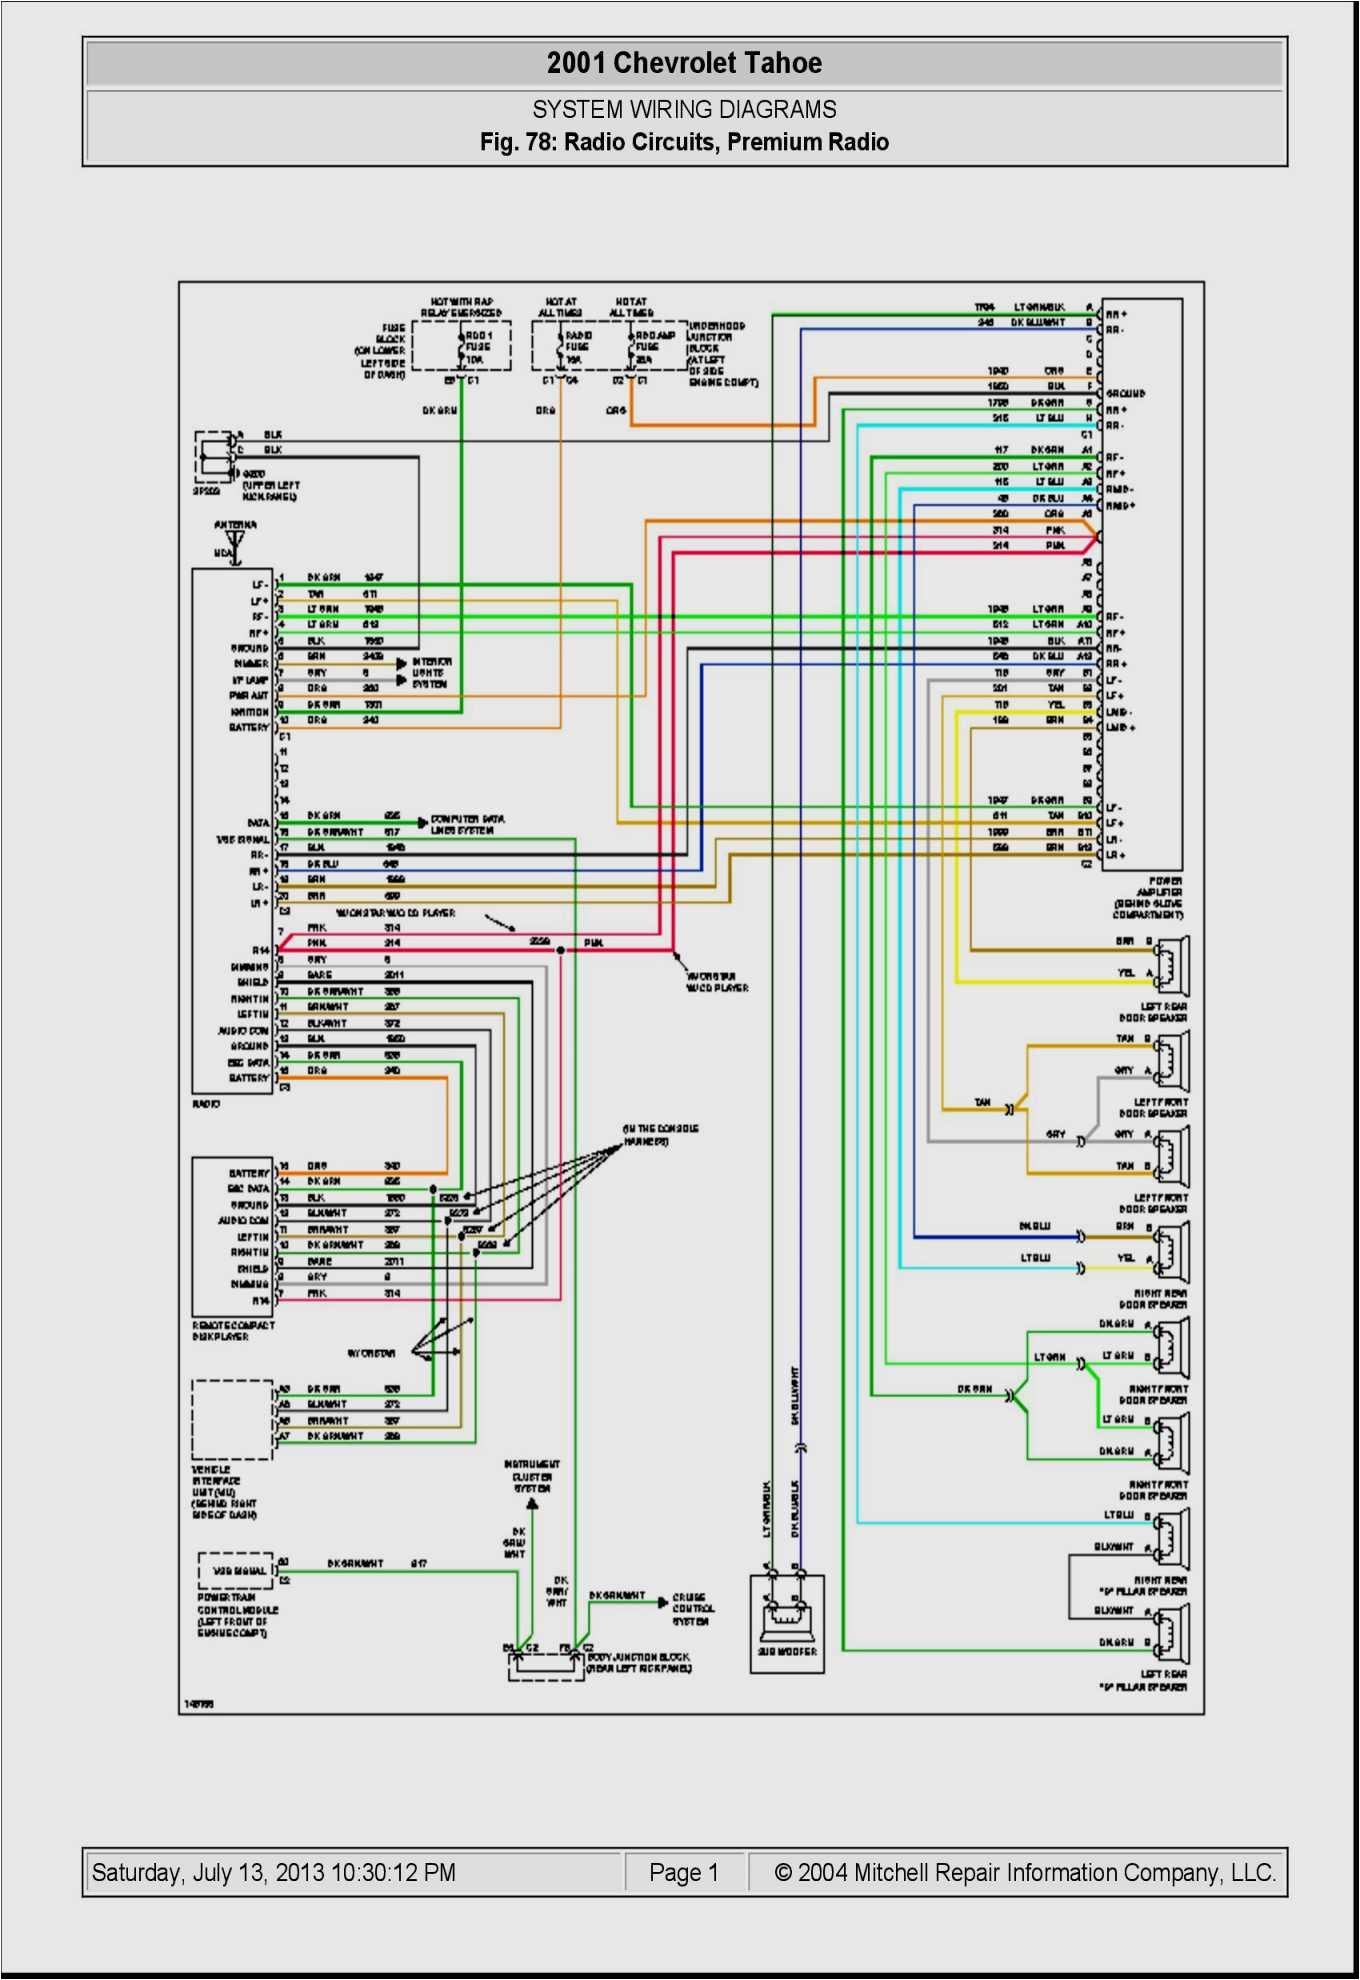 Mazda 6 Wiring Diagram 6 Speaker Wiring Diagram Wiring Diagrams